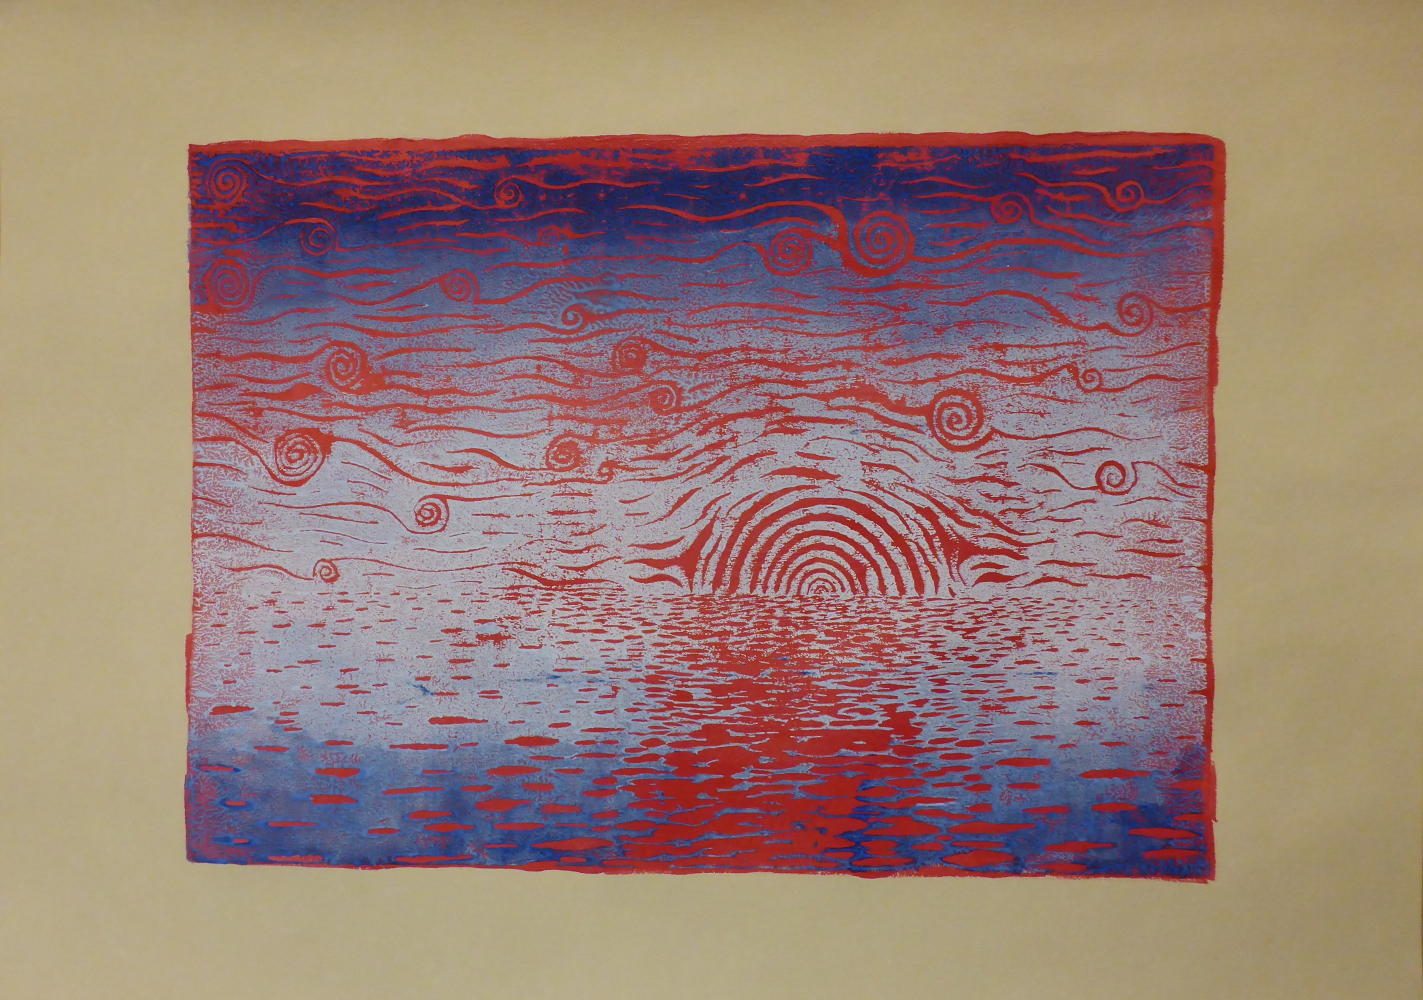 """Starry night III"", 2018, linocut and acrylic on paper, 42 x 30 cm"